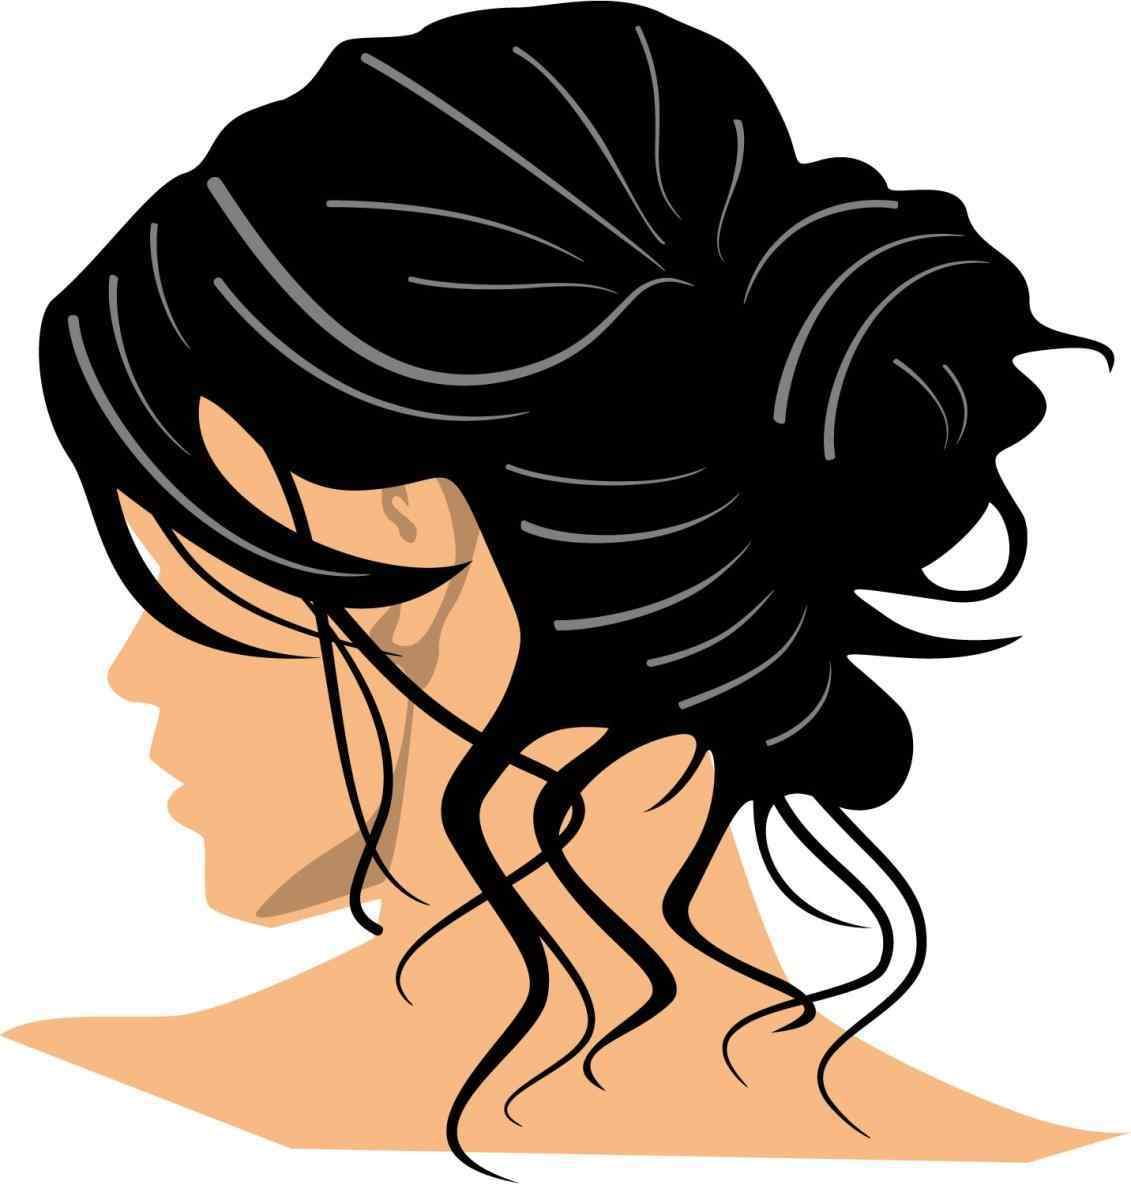 1131x1185 Clipground Woman Haircut Clipart Black And White Hair Clipground